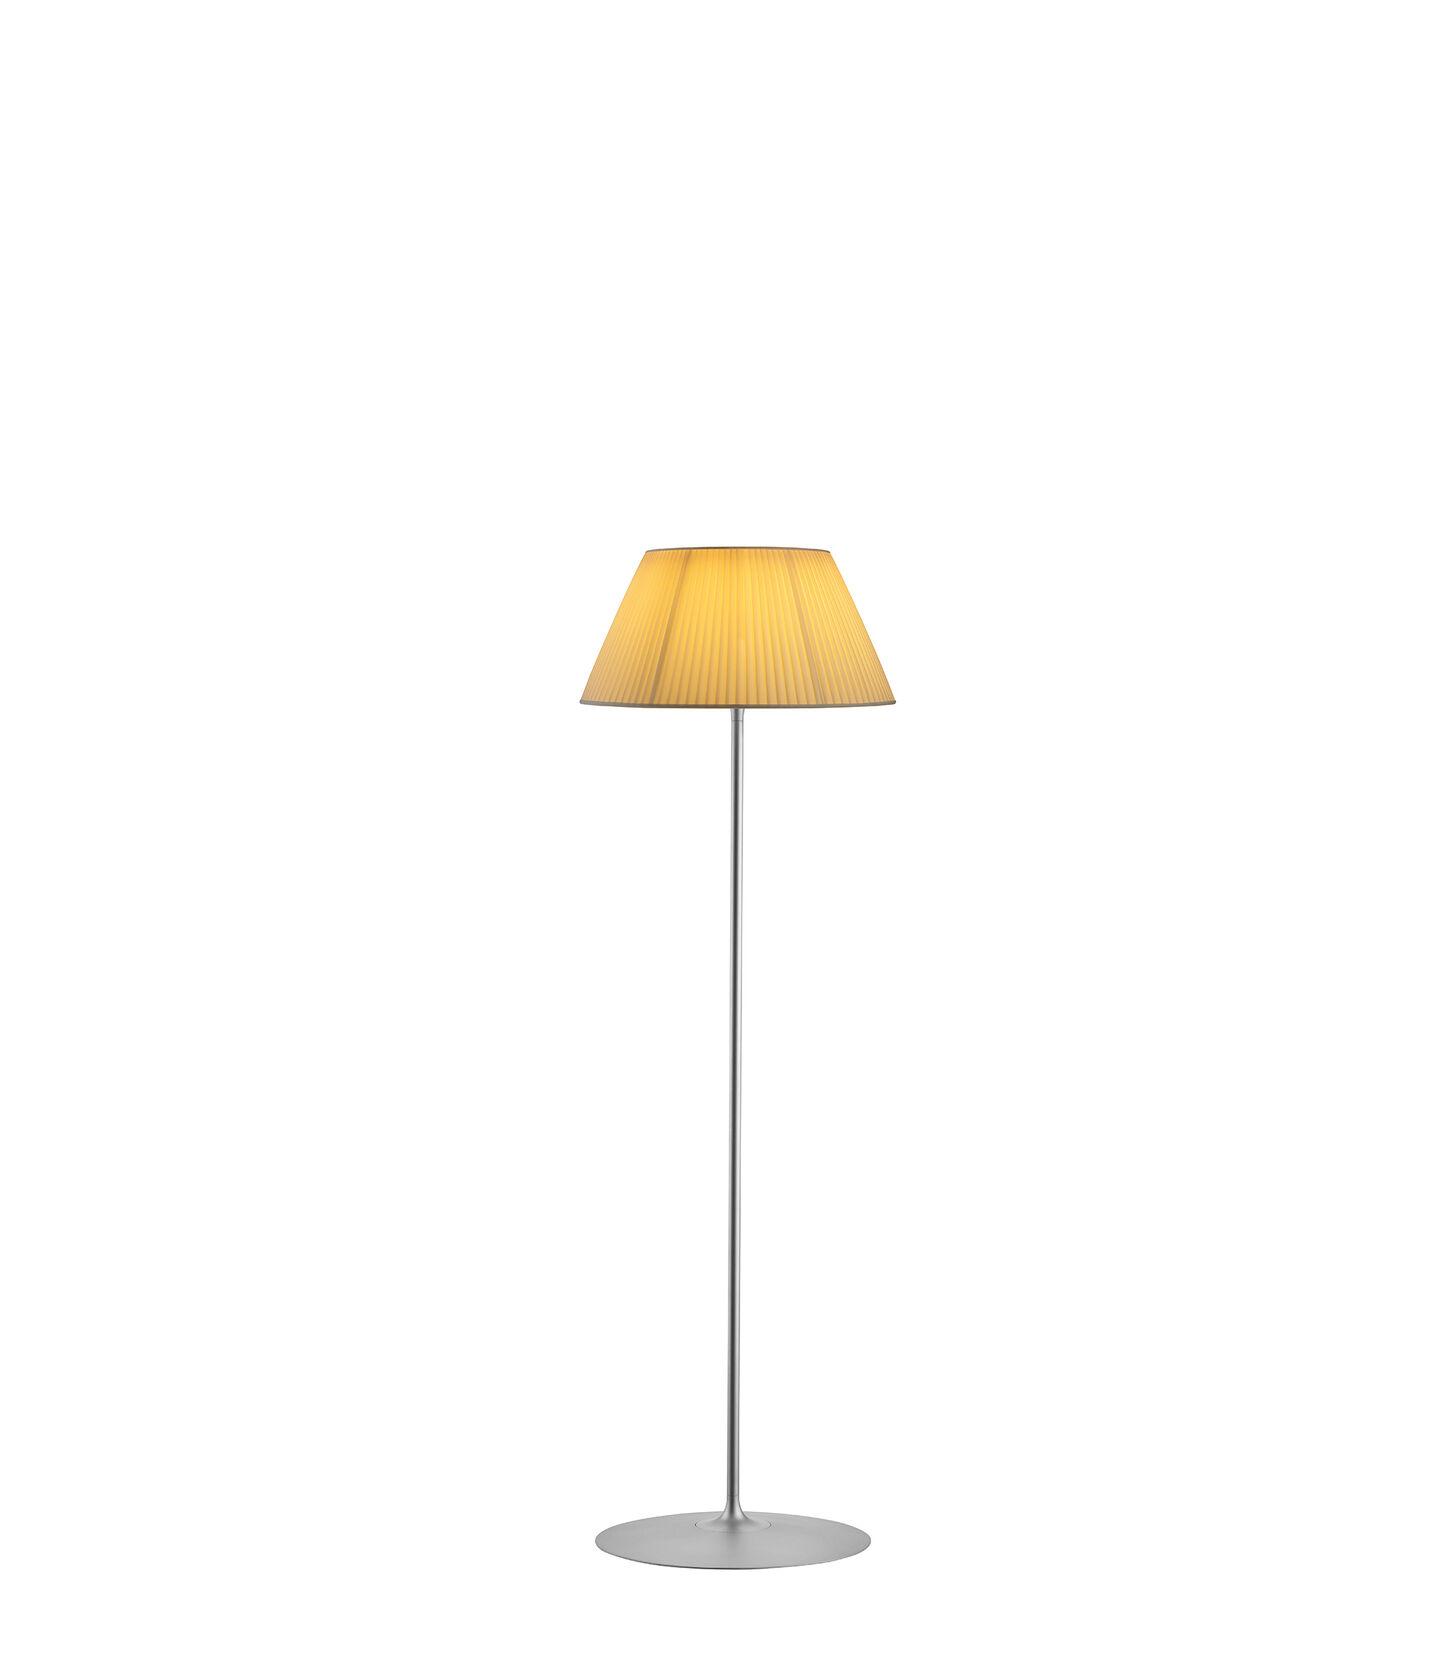 romeo-soft-floor-starck-flos-F6109007-product-still-life-big-5